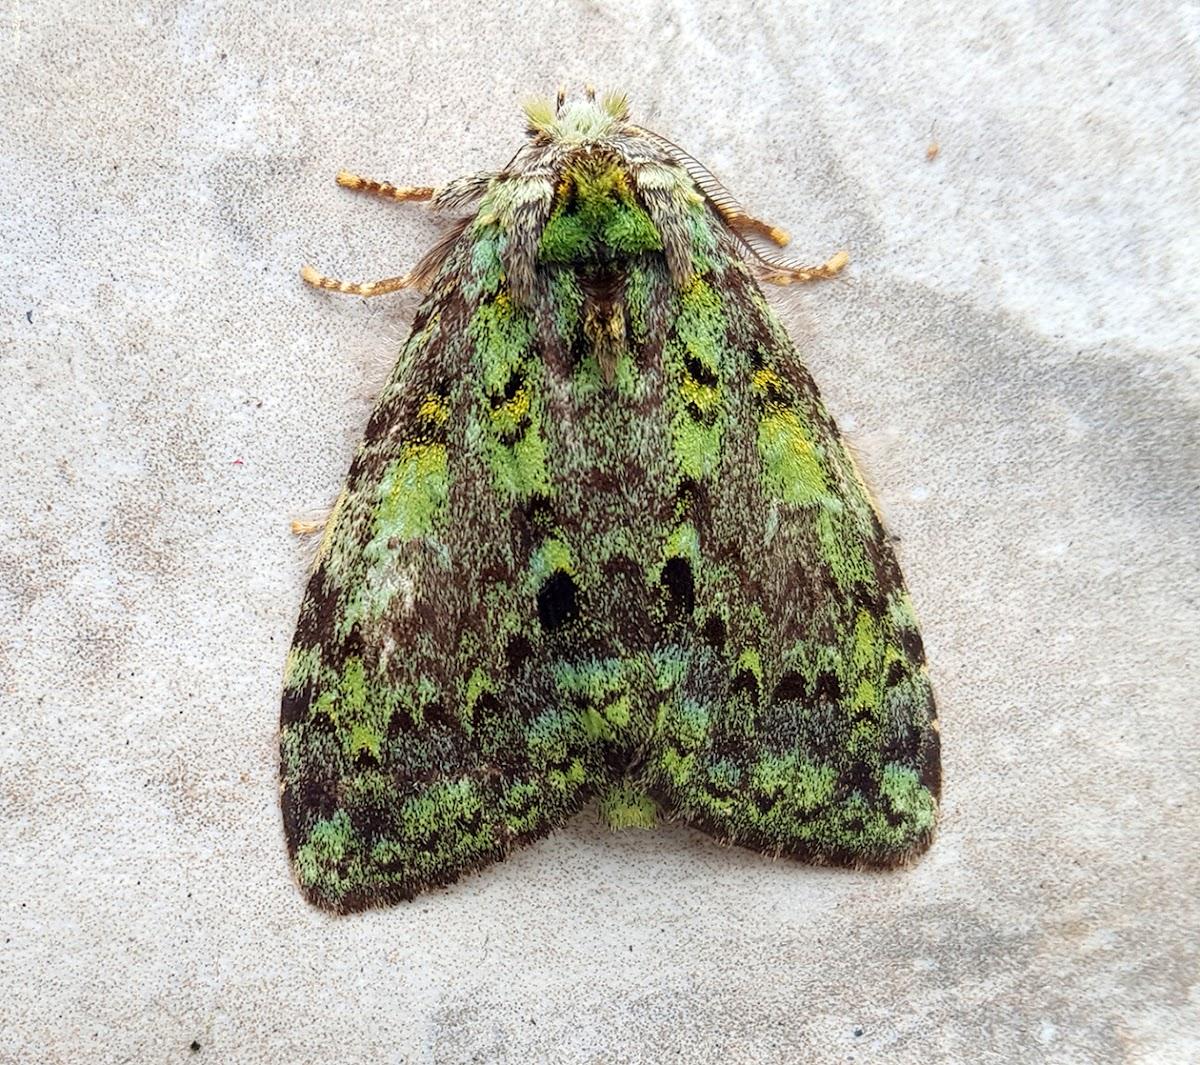 Prominent Moth